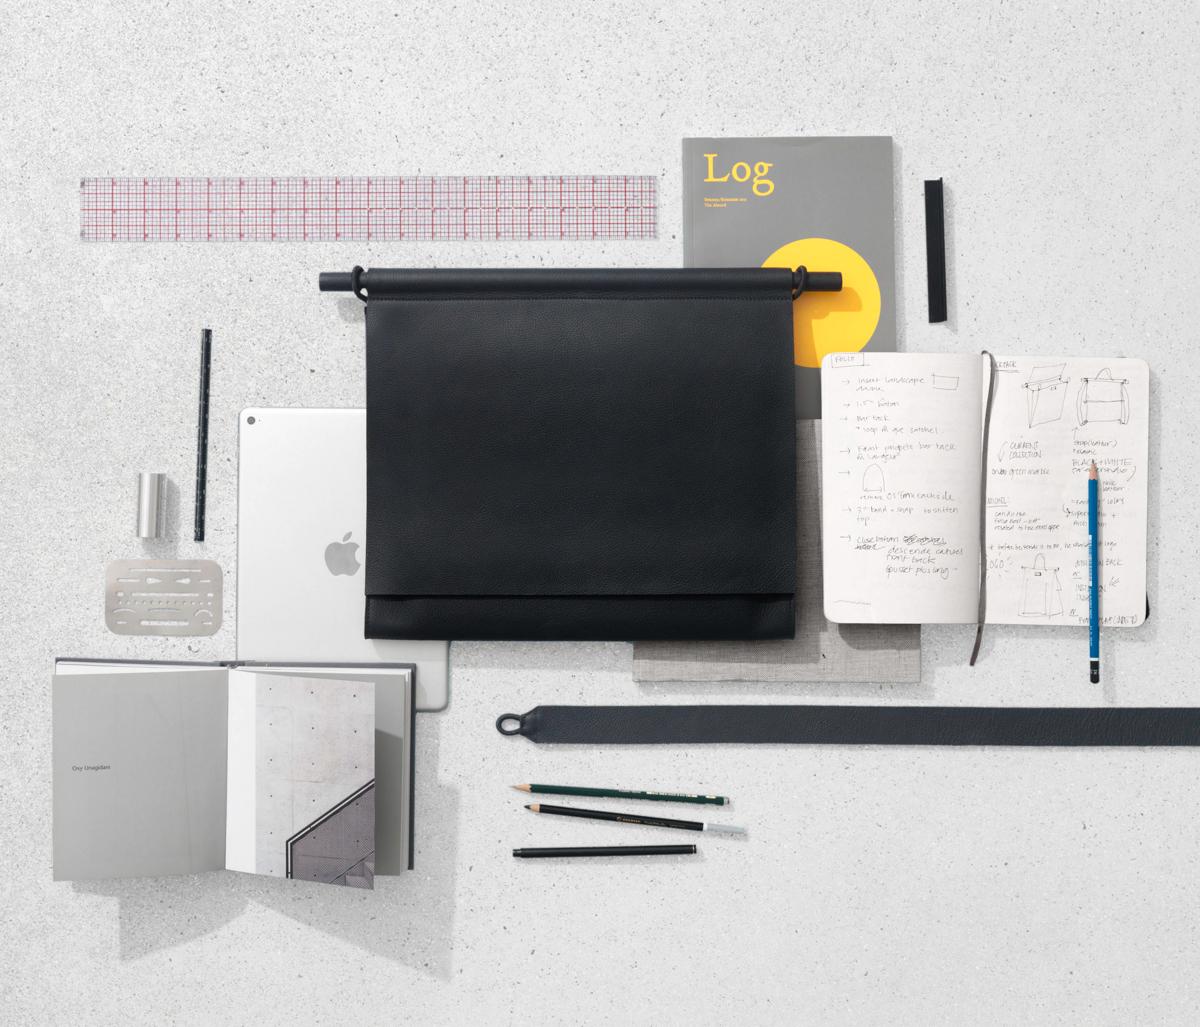 atelieryul-q_yul_-enveloppe-table